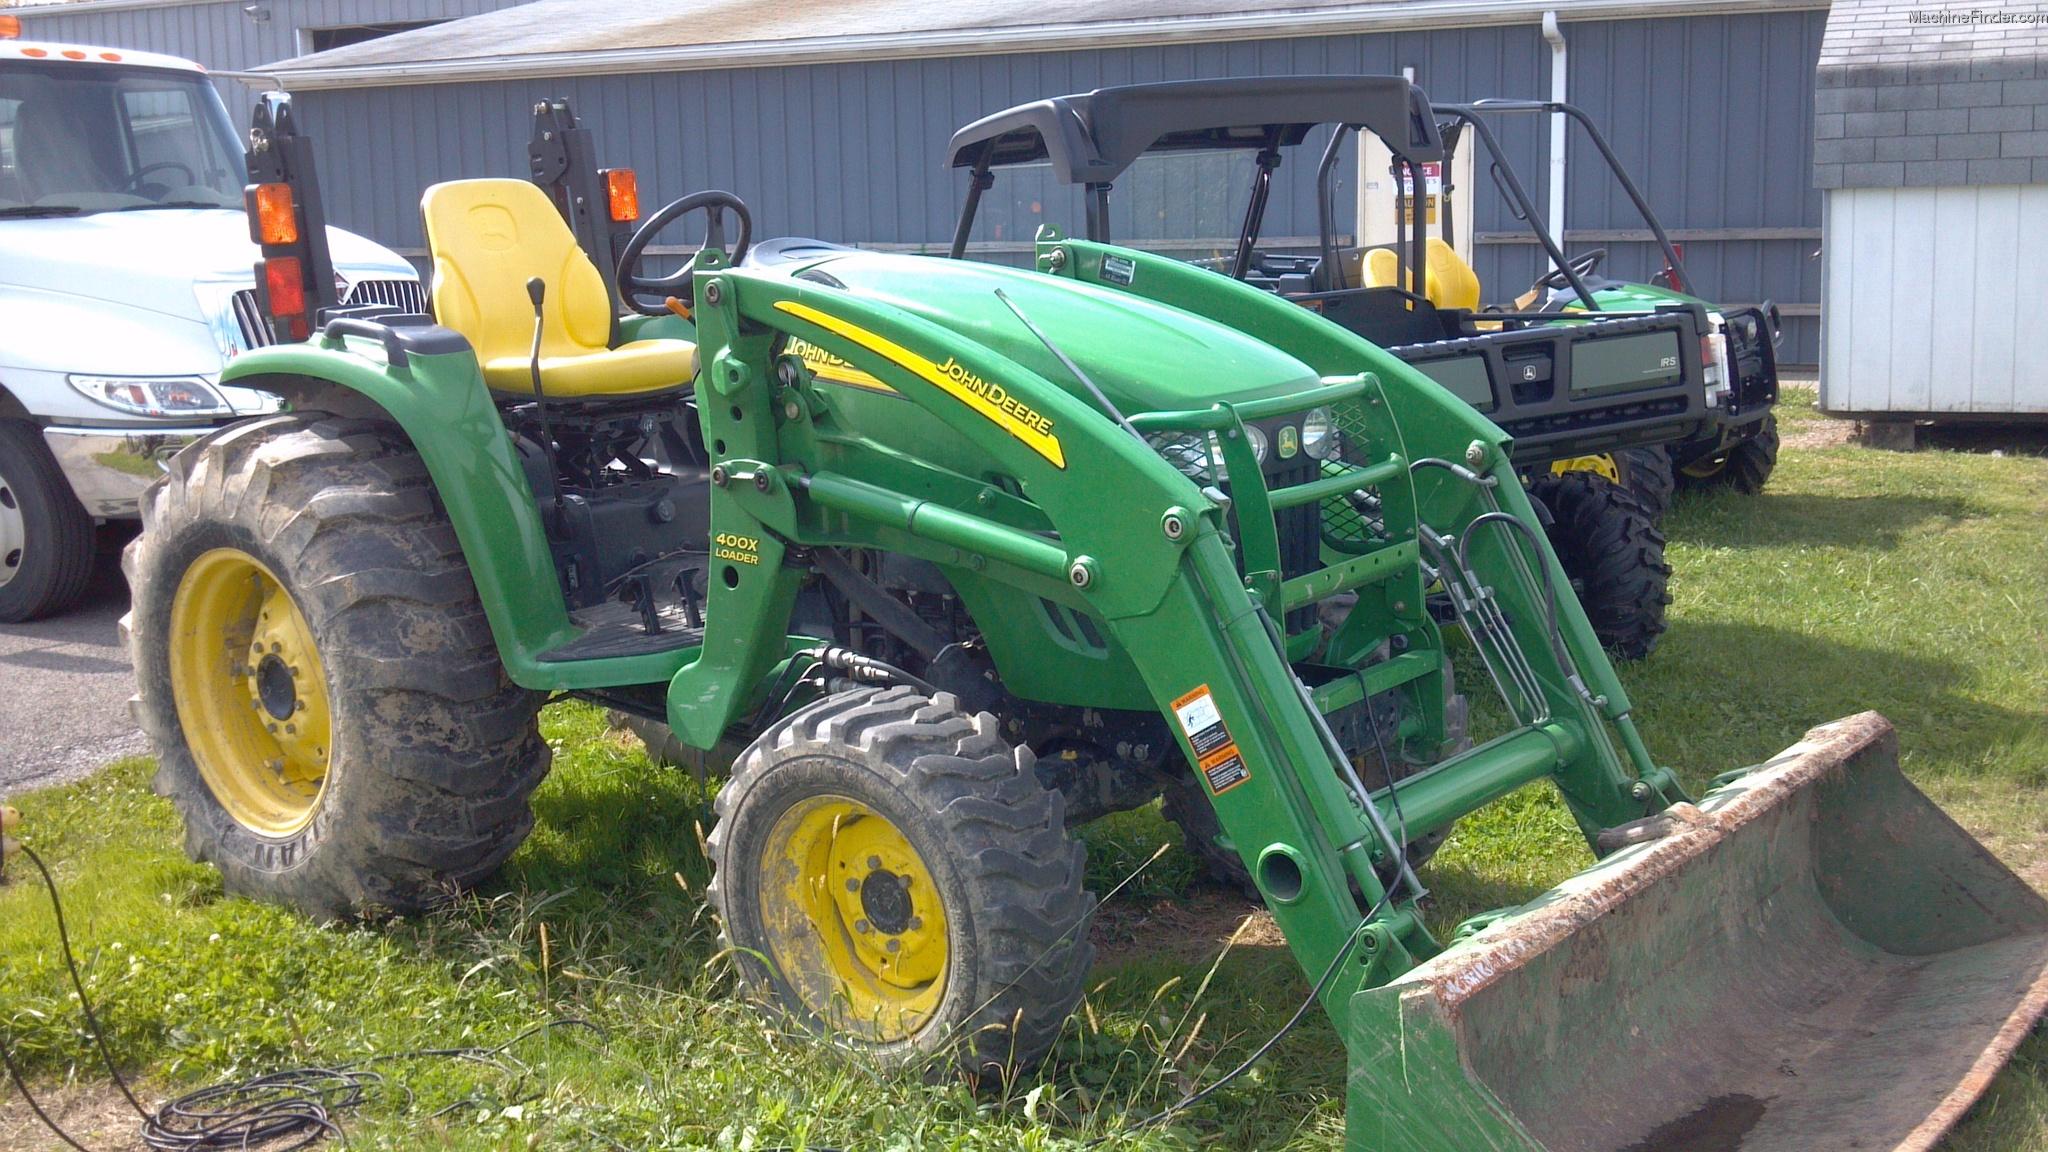 2009 John Deere 4520 Tractors - Compact (1-40hp.) - John ...